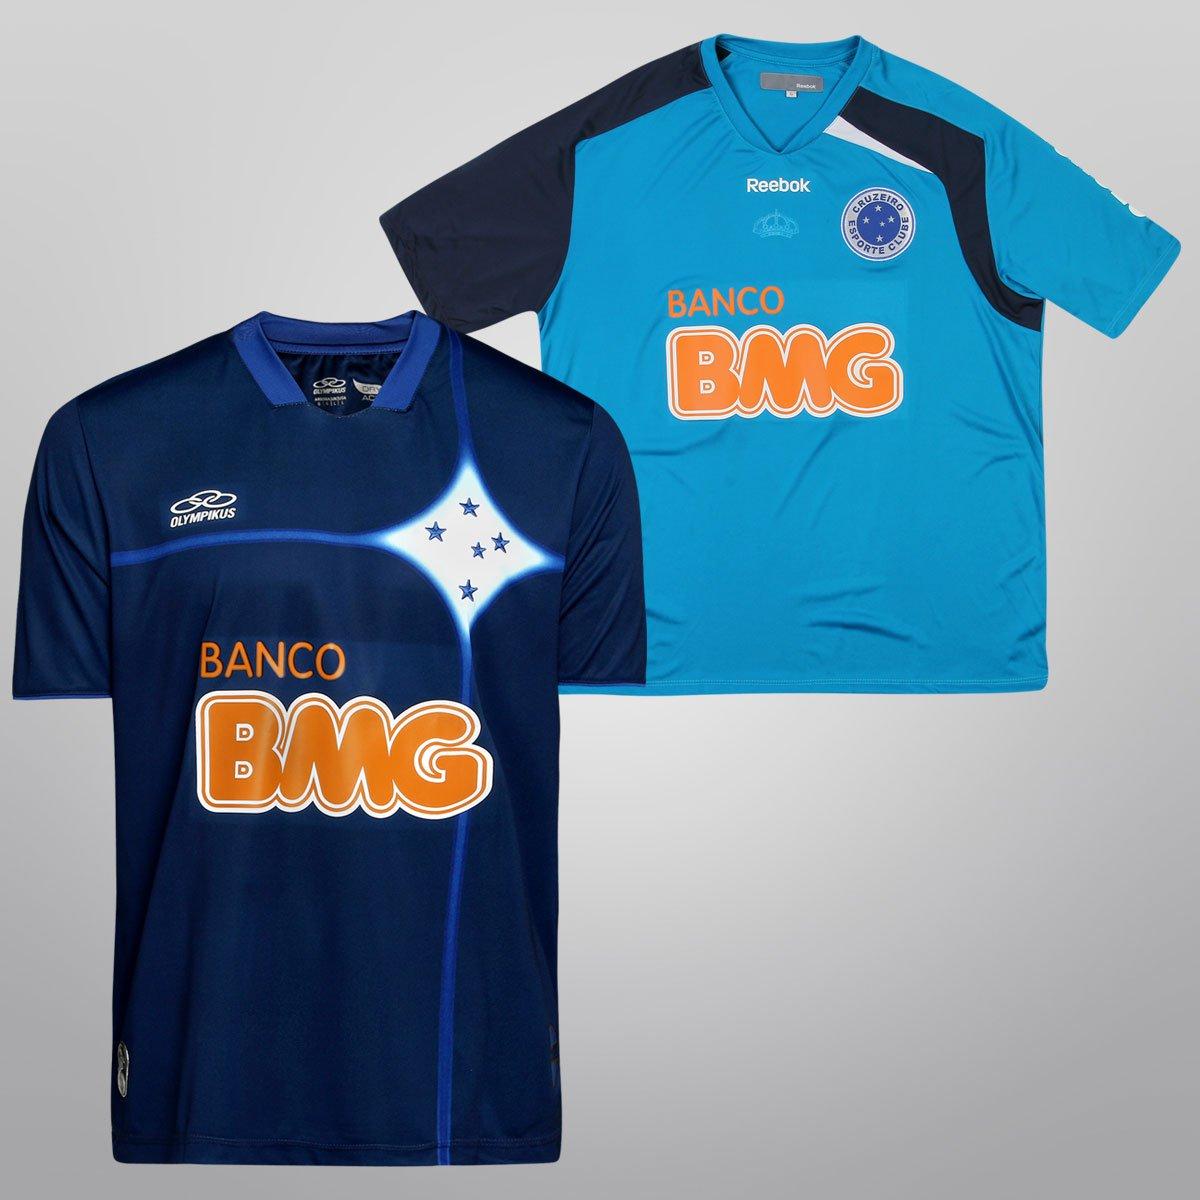 Kit Cruzeiro Torcedor - Compre Agora  232a07a80e15e